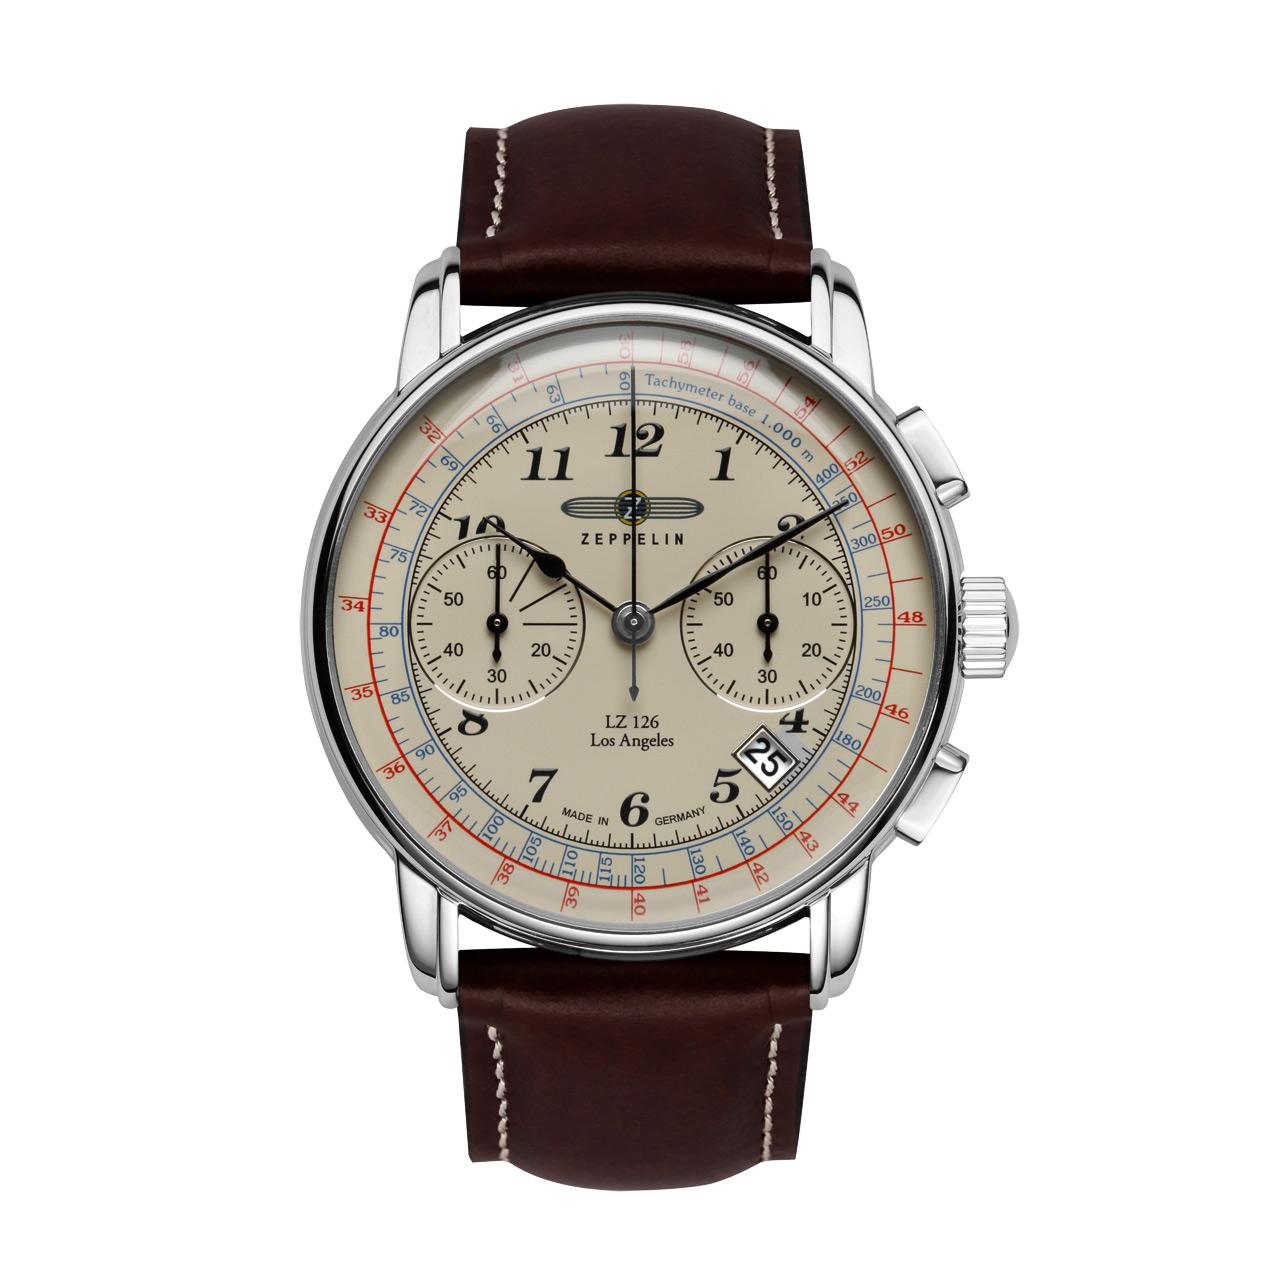 Zeppelin LZ126 Los Angeles 7614-5 Herren Armbanduhr Chronograph